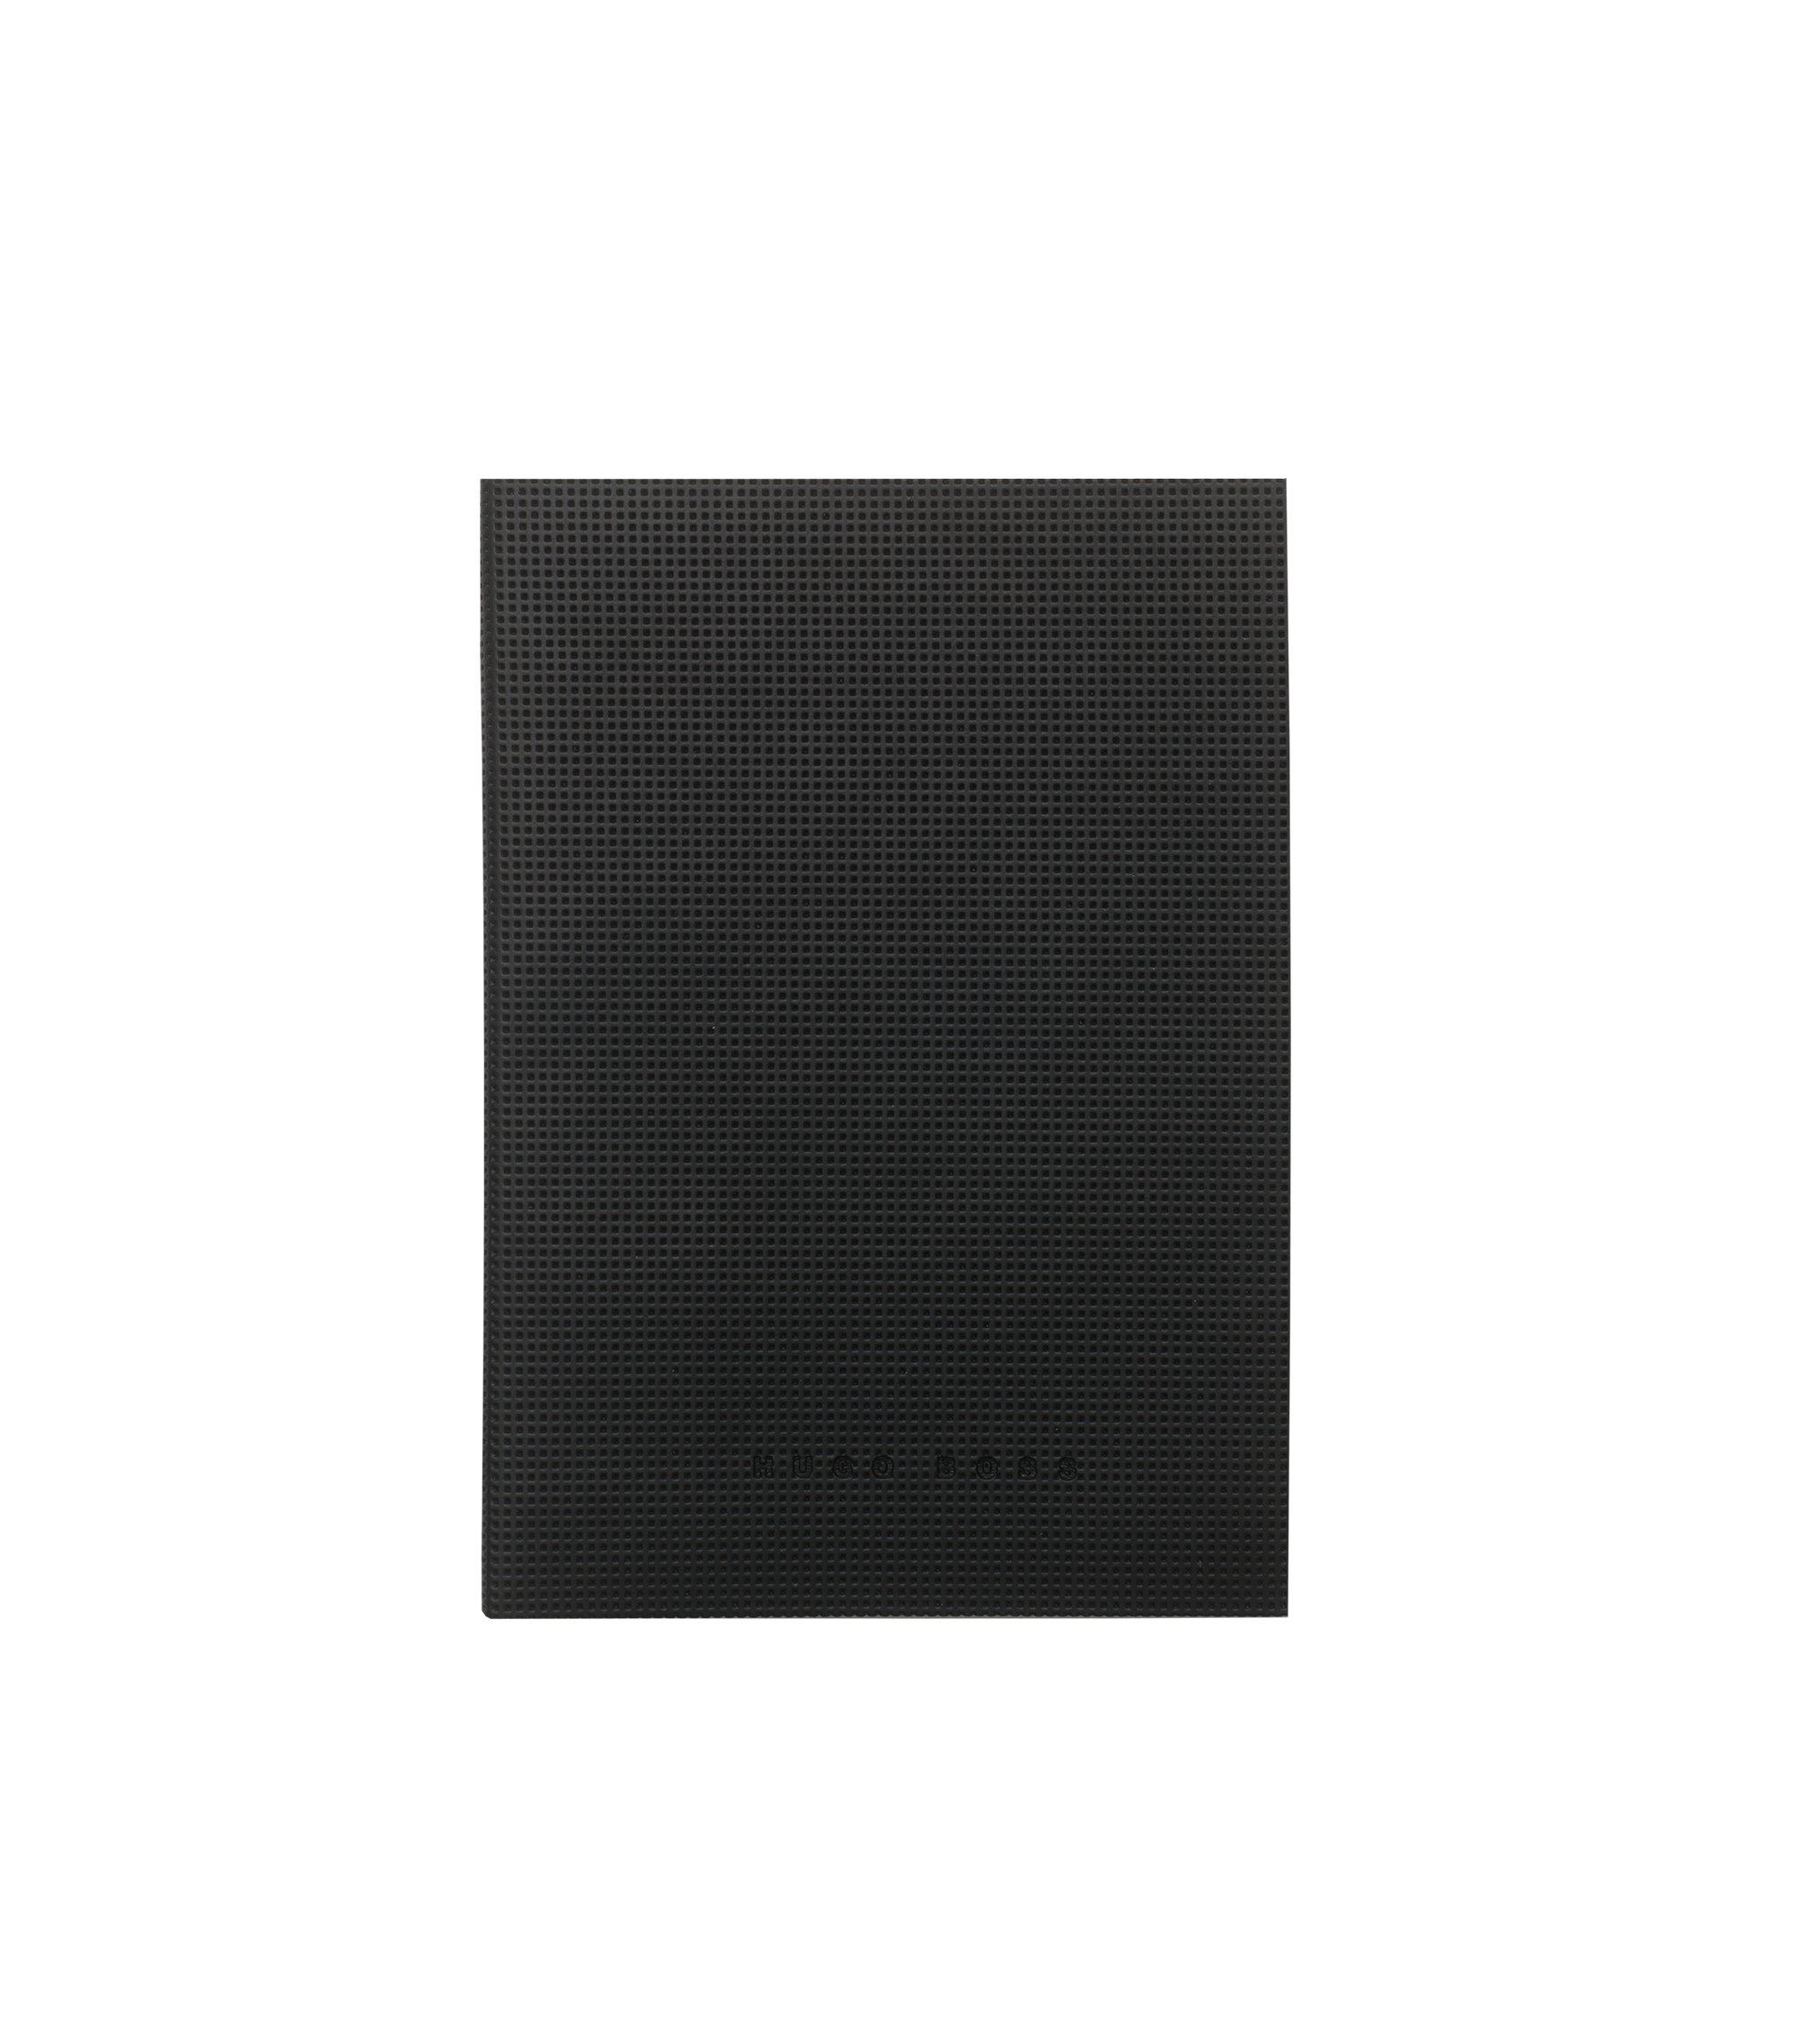 A5-notitieboek: 'Grid Soft', Zwart